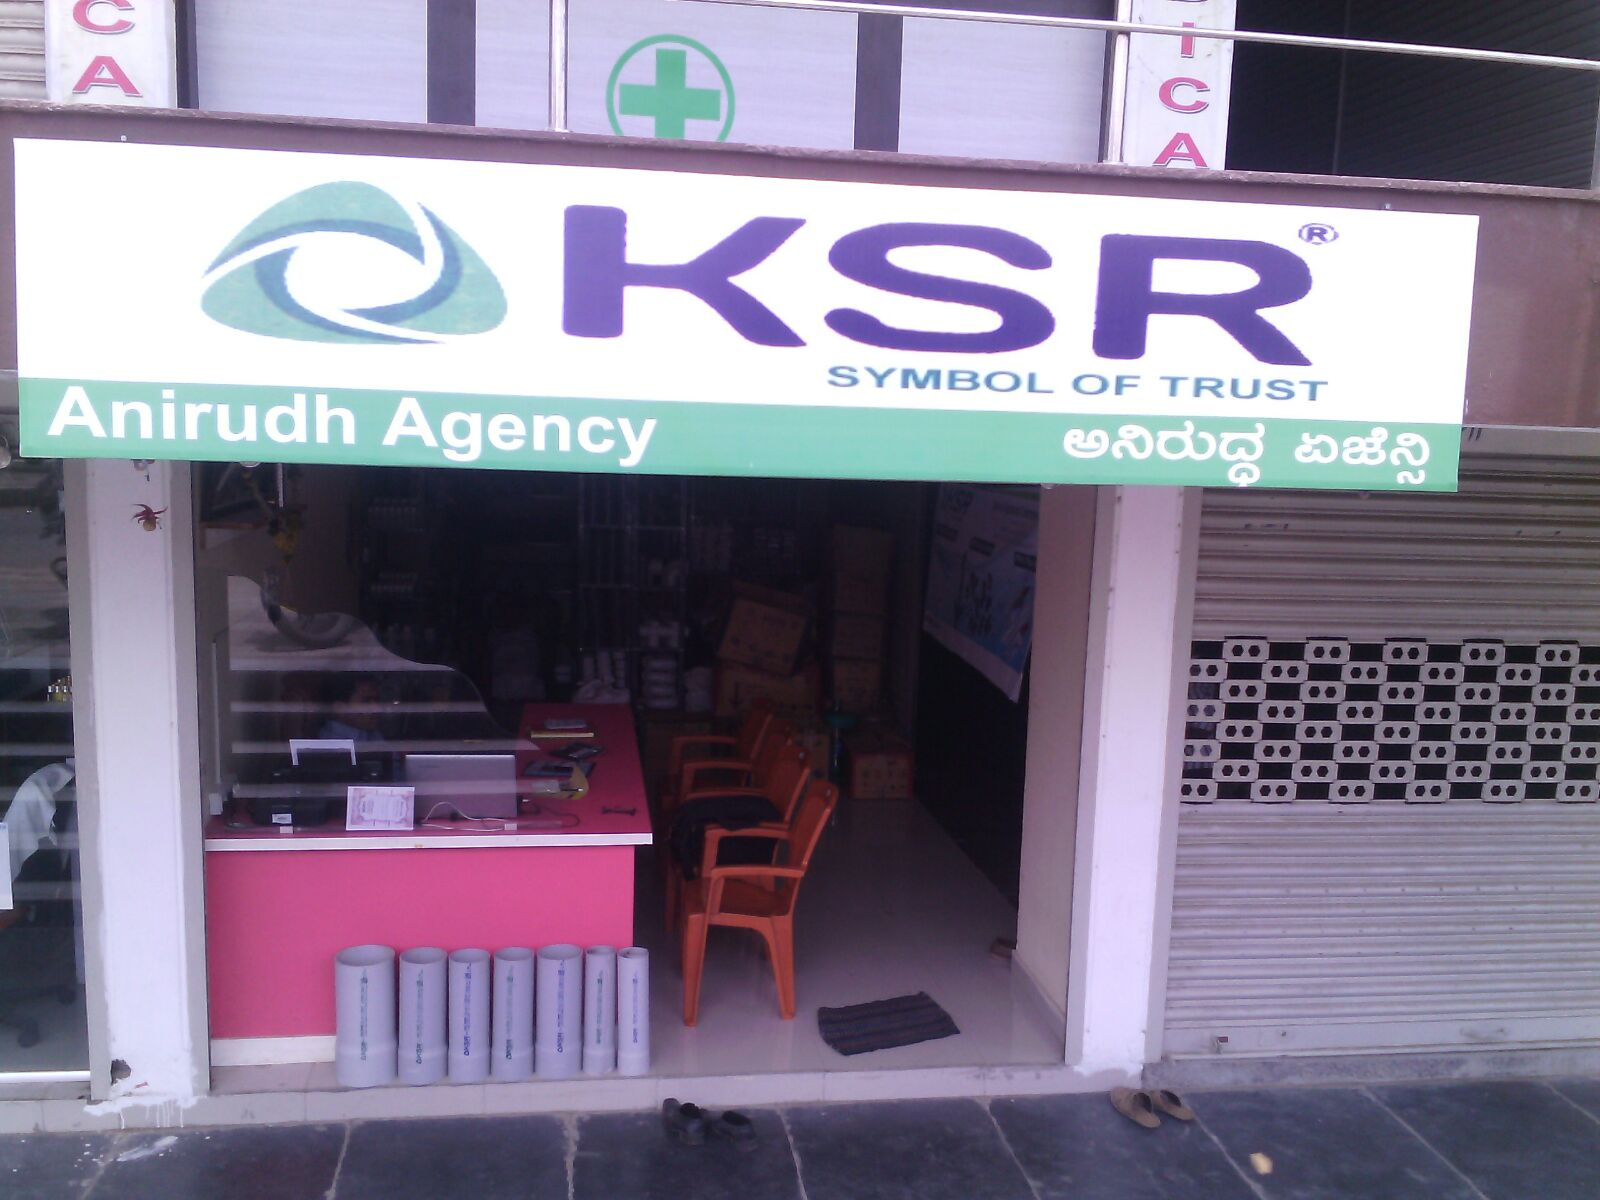 Anirudh Agency